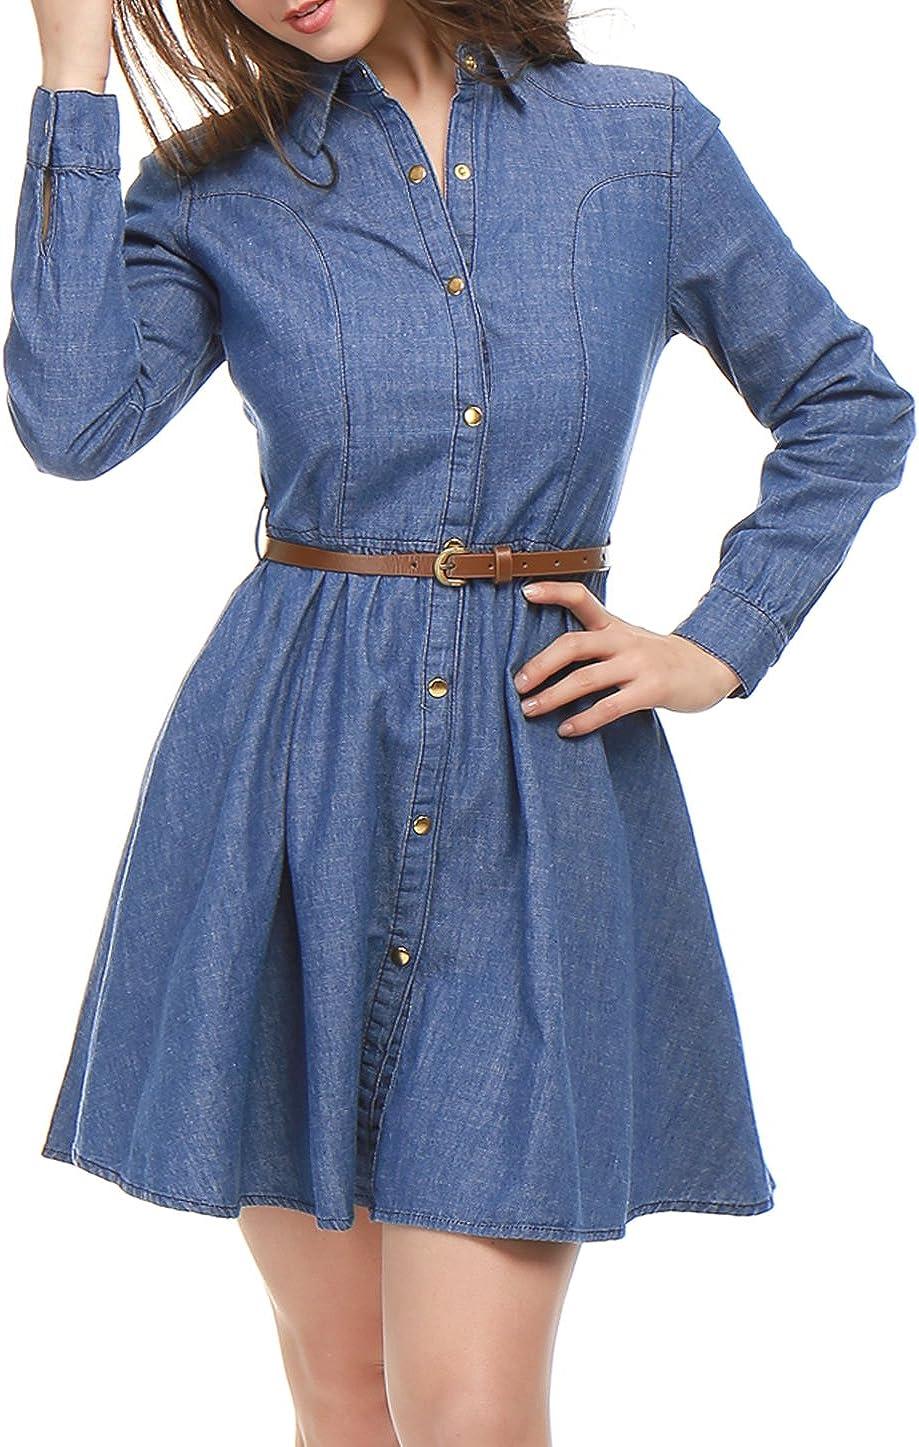 Allegra K Women's Denim Belted Shirt Knee Flared Recommendation Dress Max 48% OFF Above